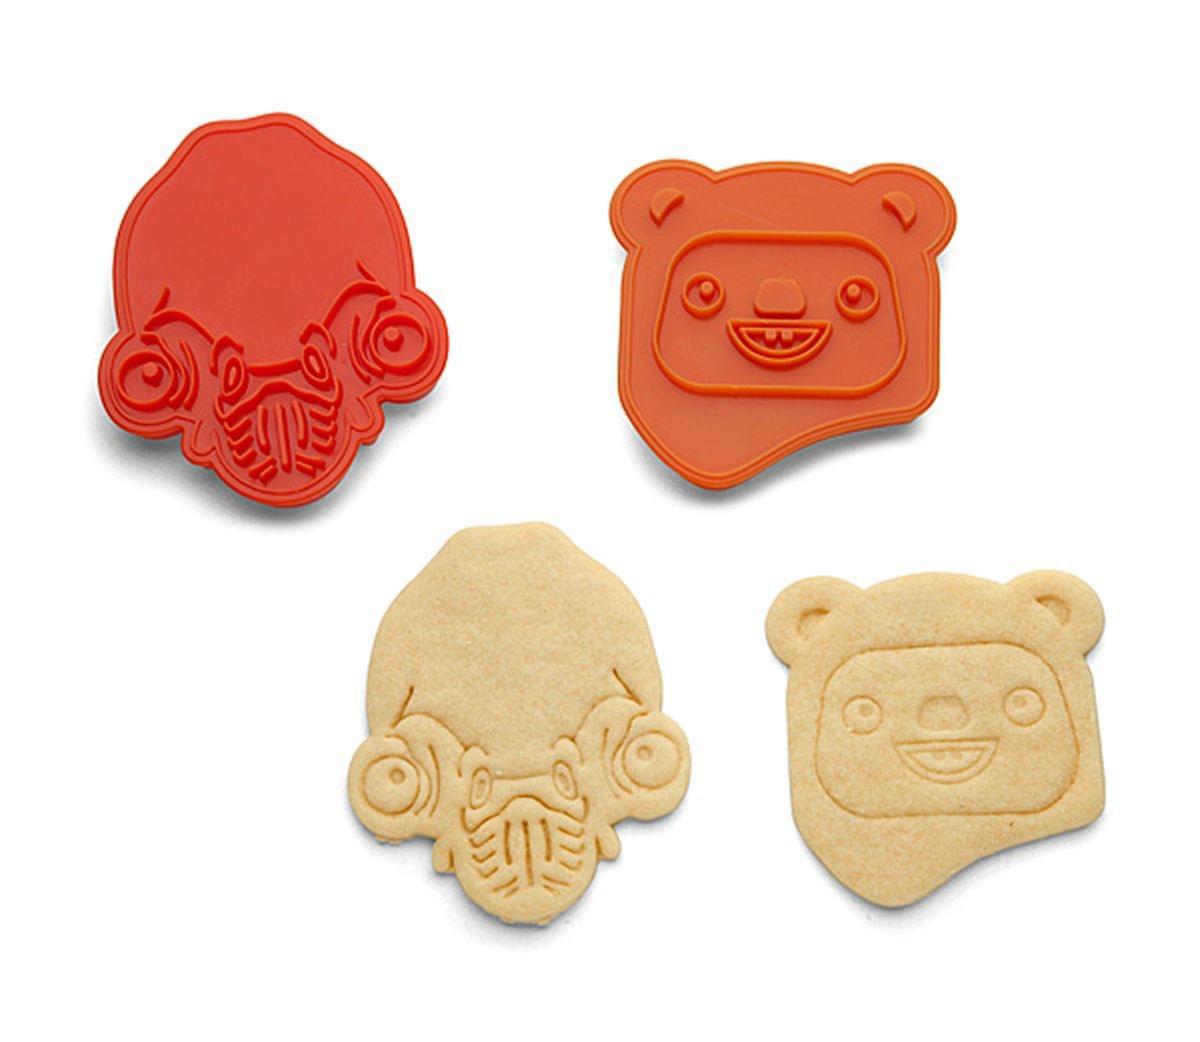 Star Wars Endor Cookie Cutter 2-Pack